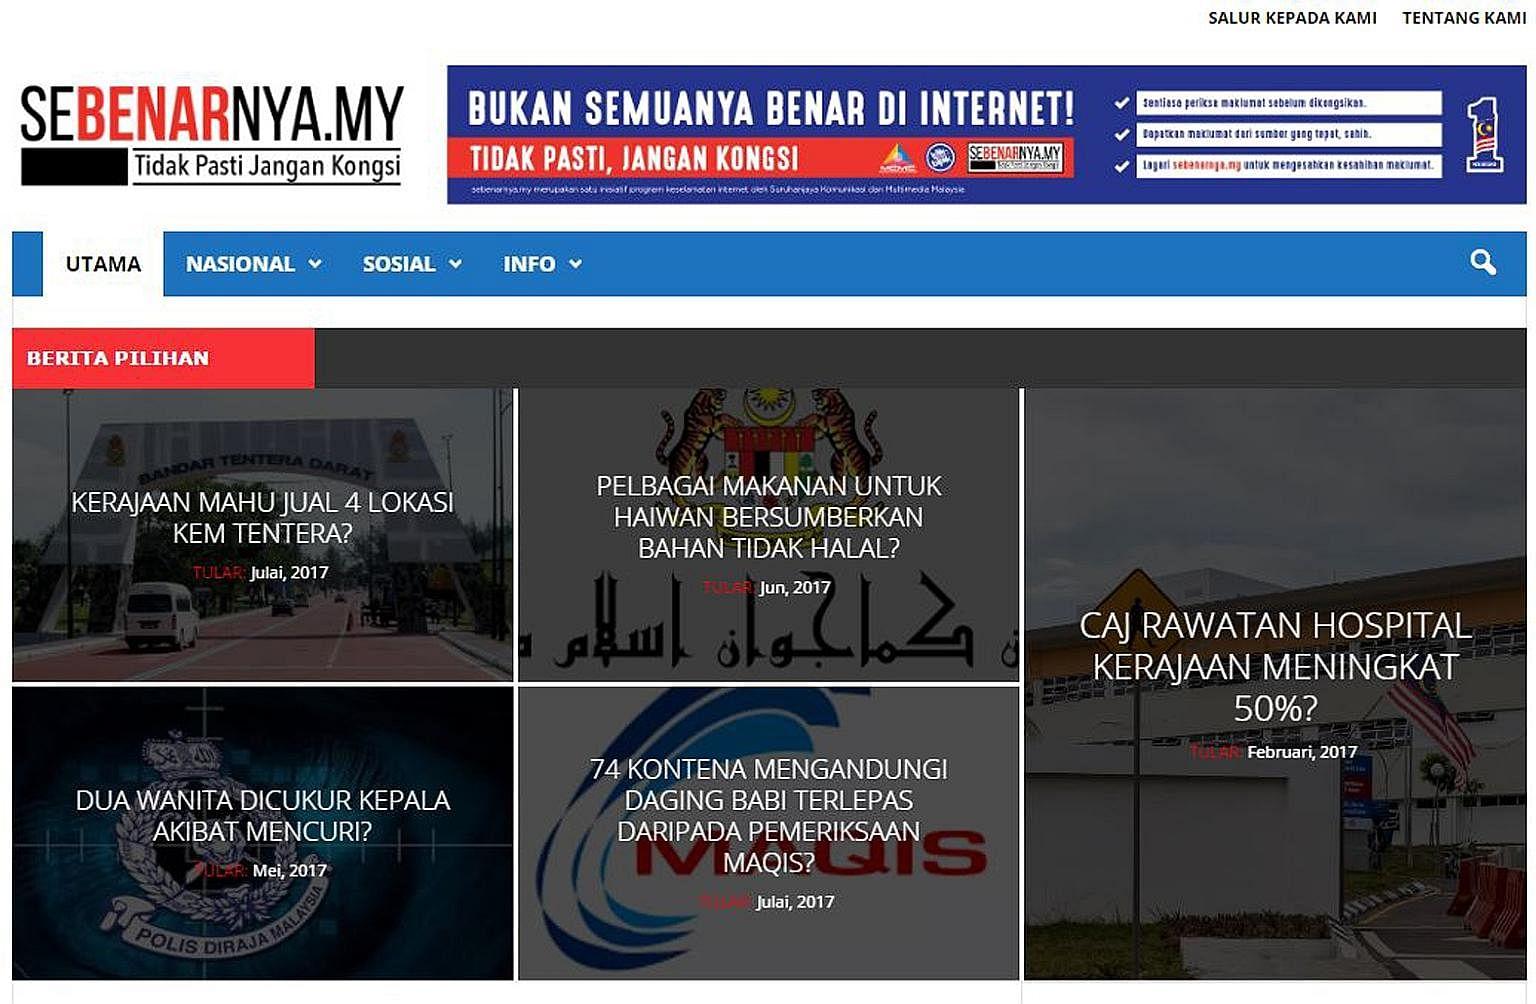 Malaysia set up fact-checking website Sebenarnya.my to verify the authenticity of news on social media.